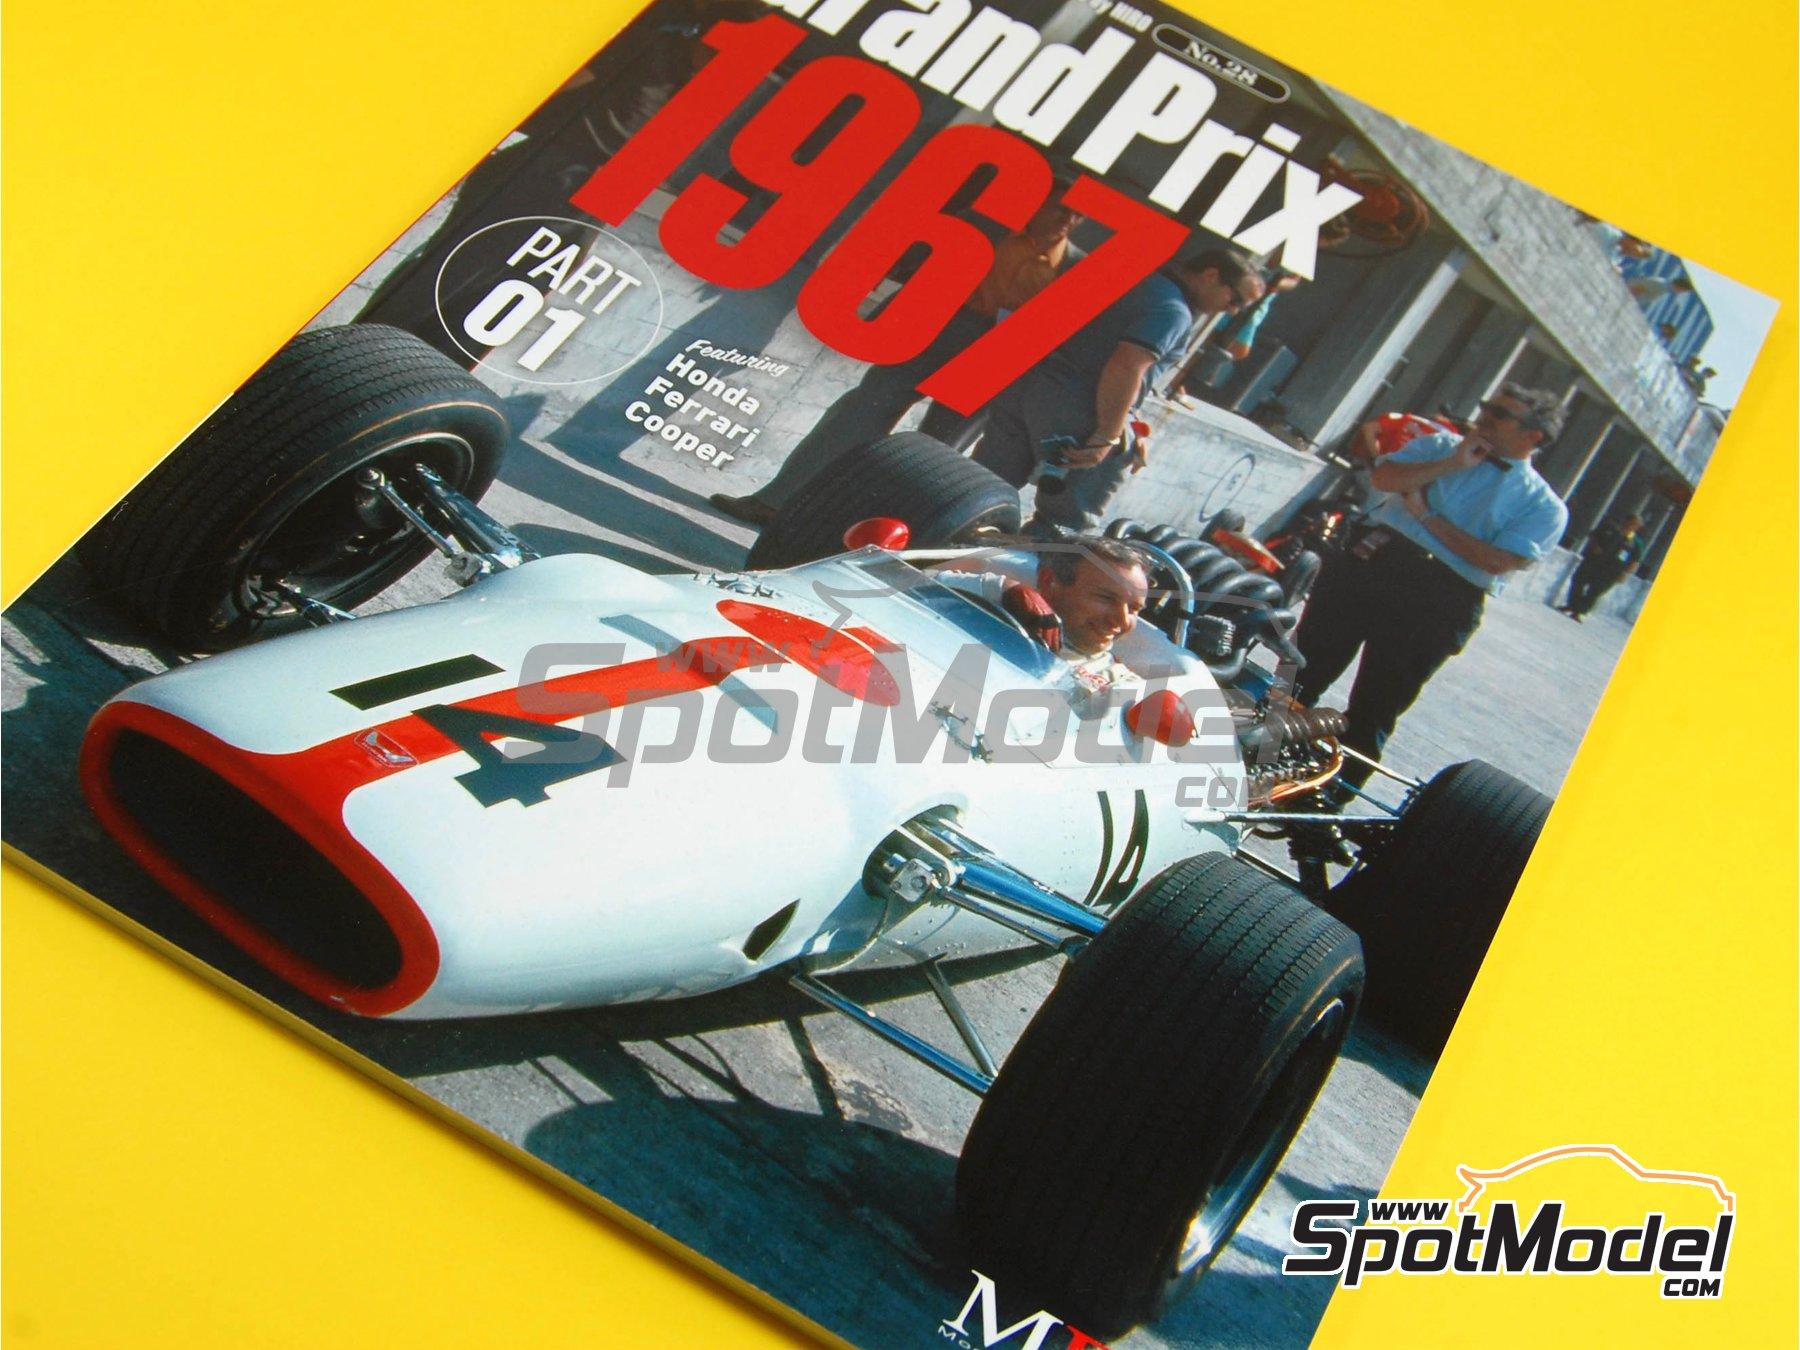 Image 1: JOE HONDA Racing Pictorial Series - Grand Prix Cars - Primer volumen -  1967   Libro de referencia fabricado por Model Factory Hiro (ref.MFH-JH28)